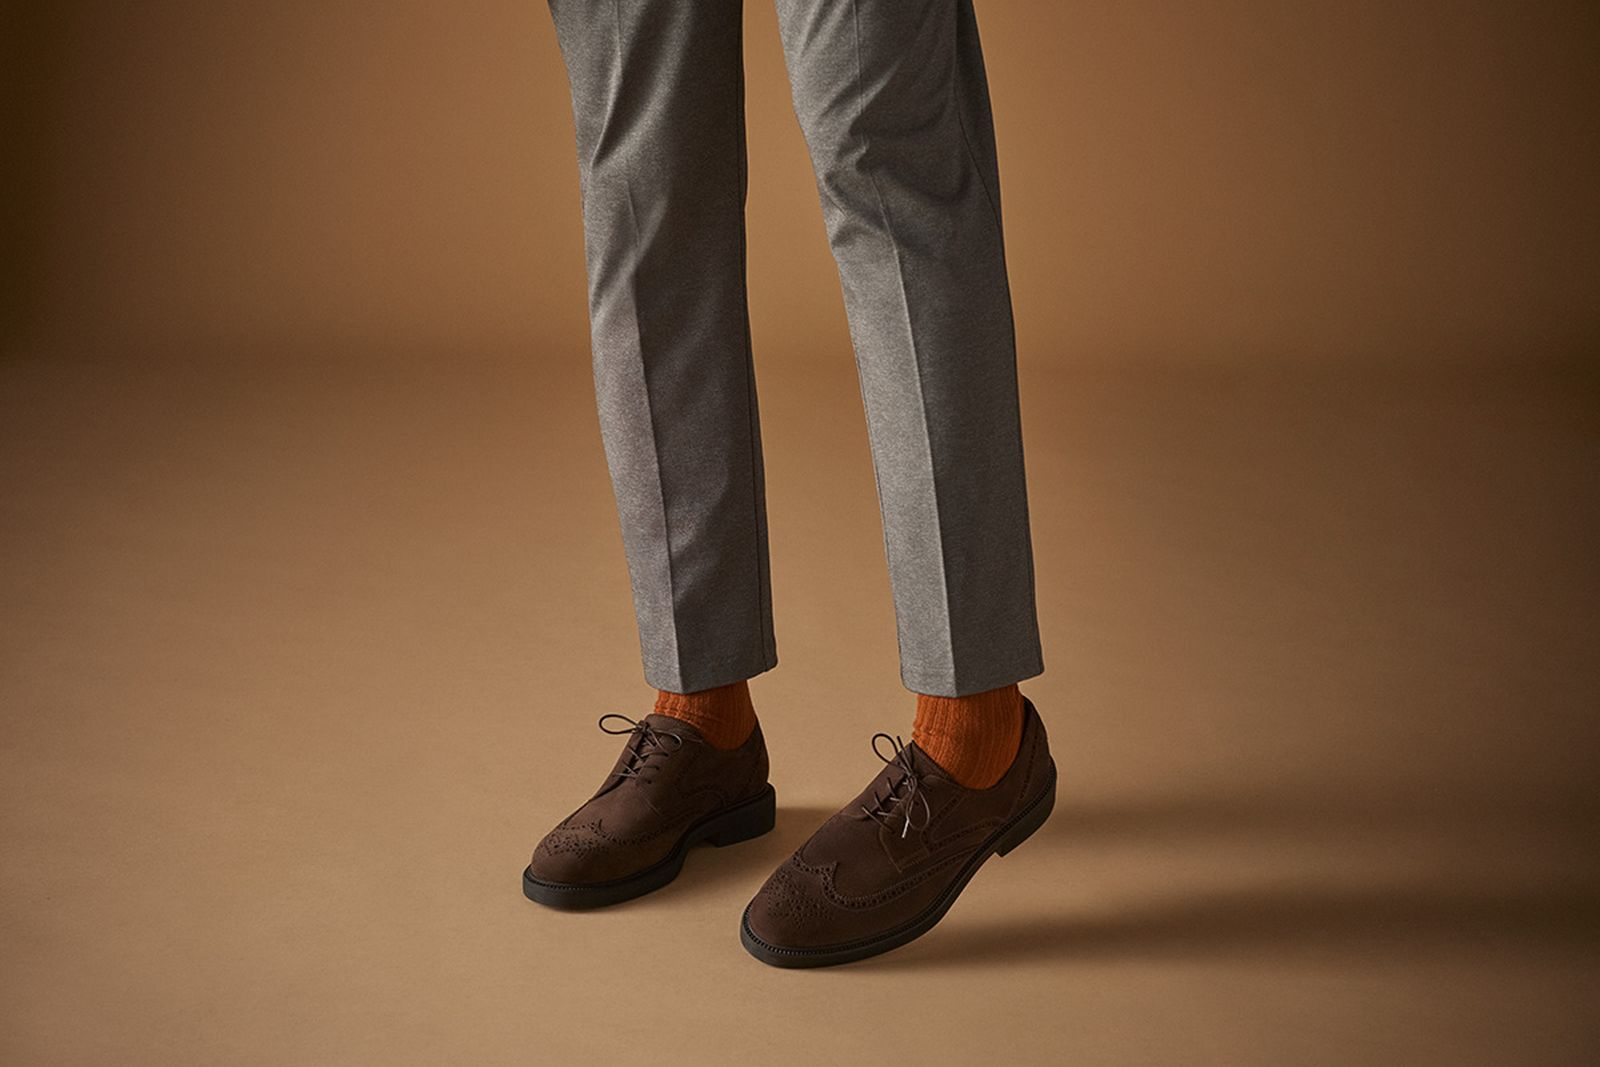 vagabond shoemakers interview